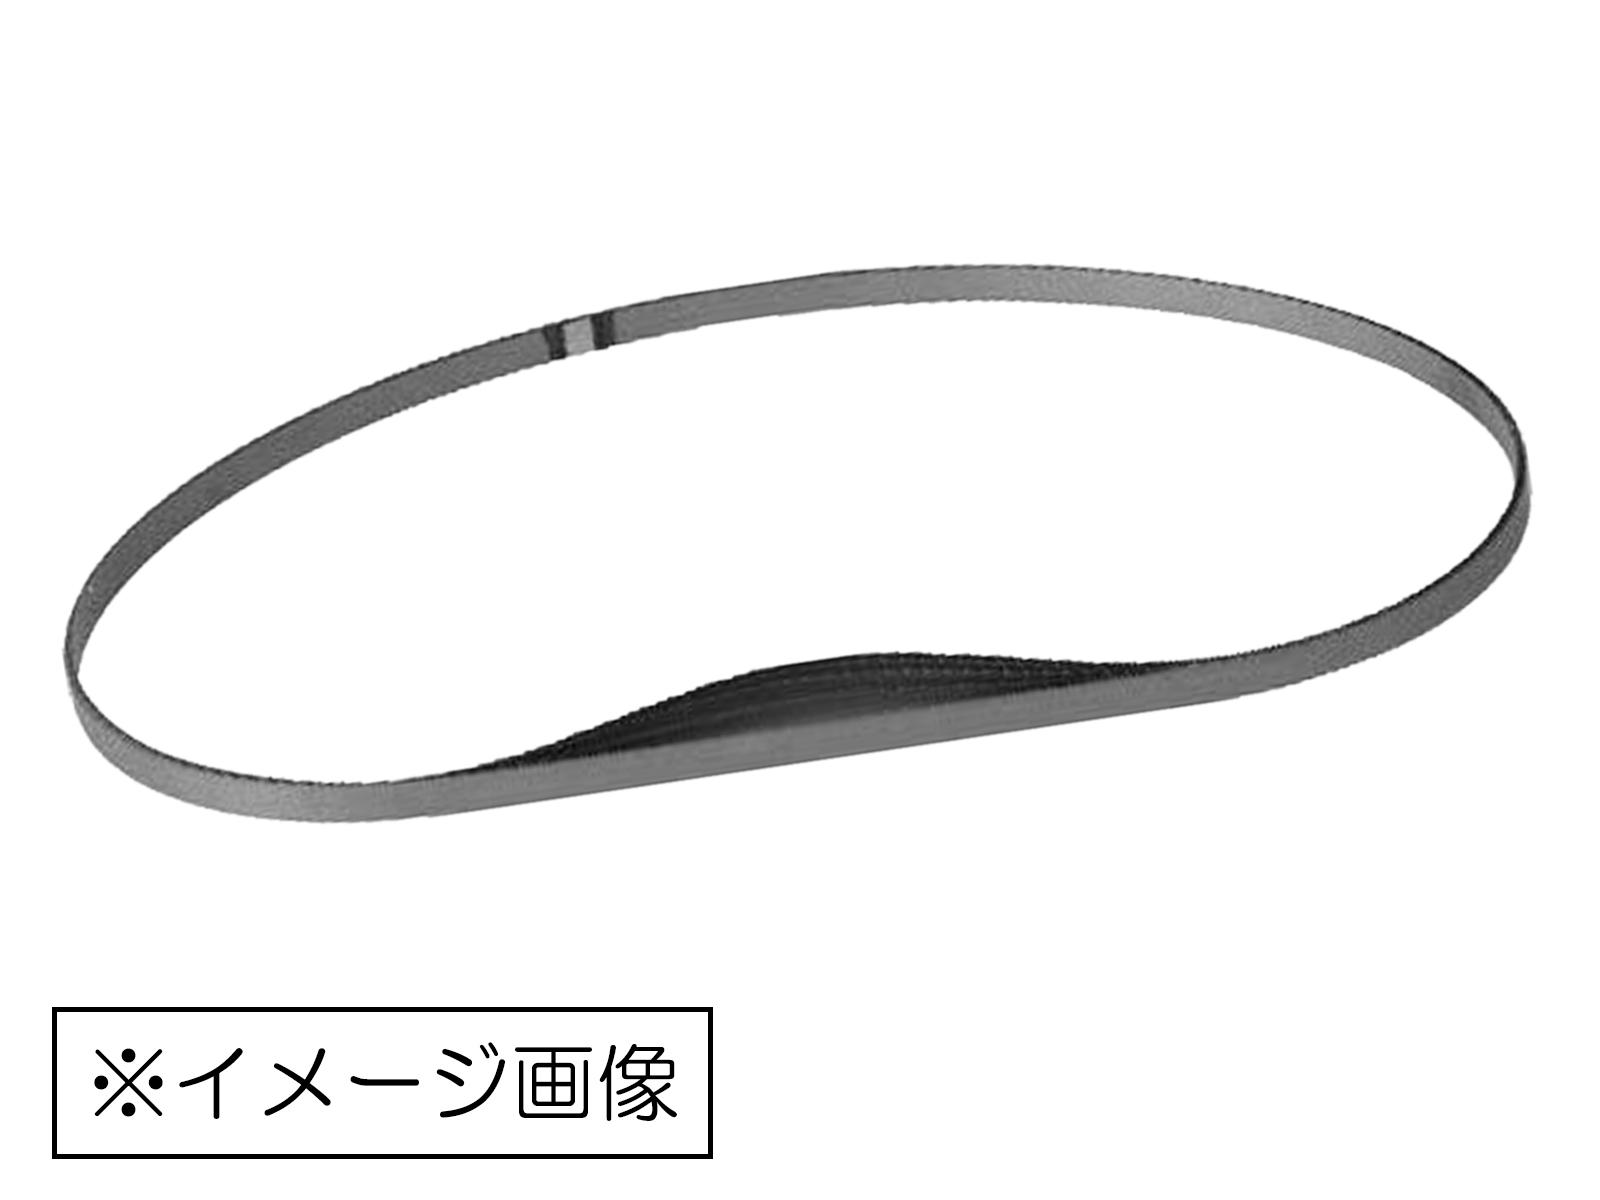 HiKOKI(旧日立工機) ロータリバンドソー用帯のこ刃 No.27 0032-7170 山数:18/インチ(5本入)